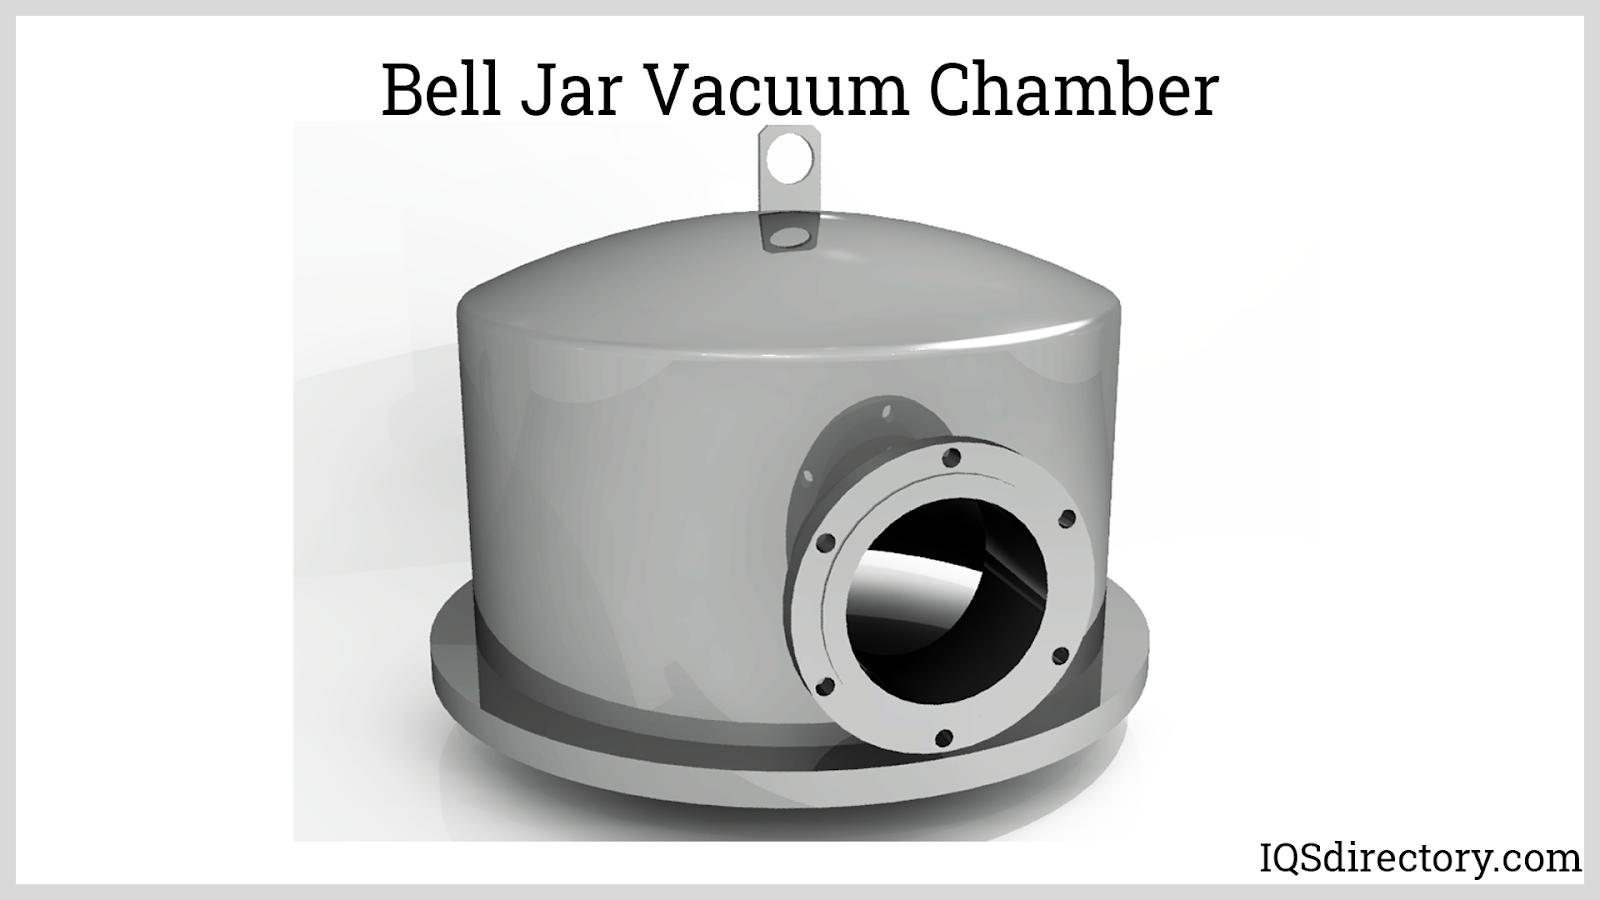 Bell Jar Vacuum Chamber